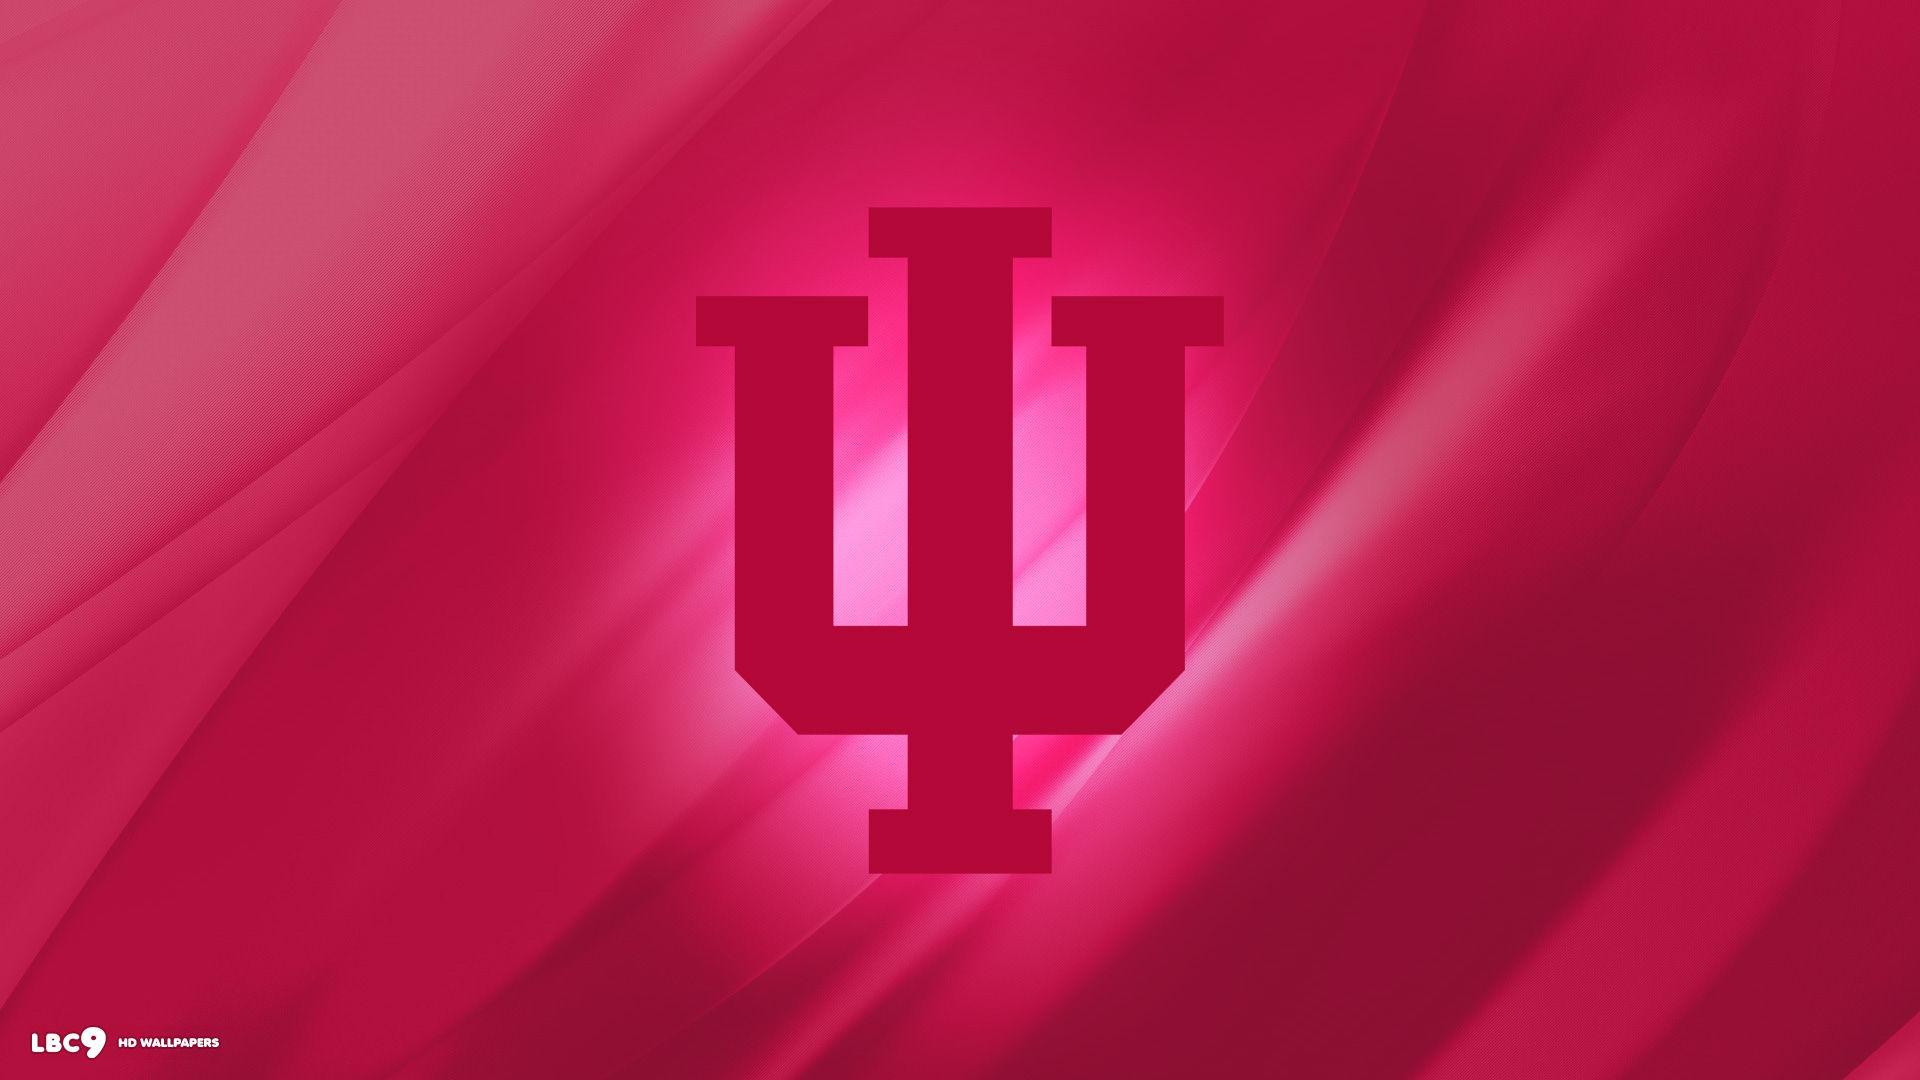 Indiana University Wallpaper 65 Images